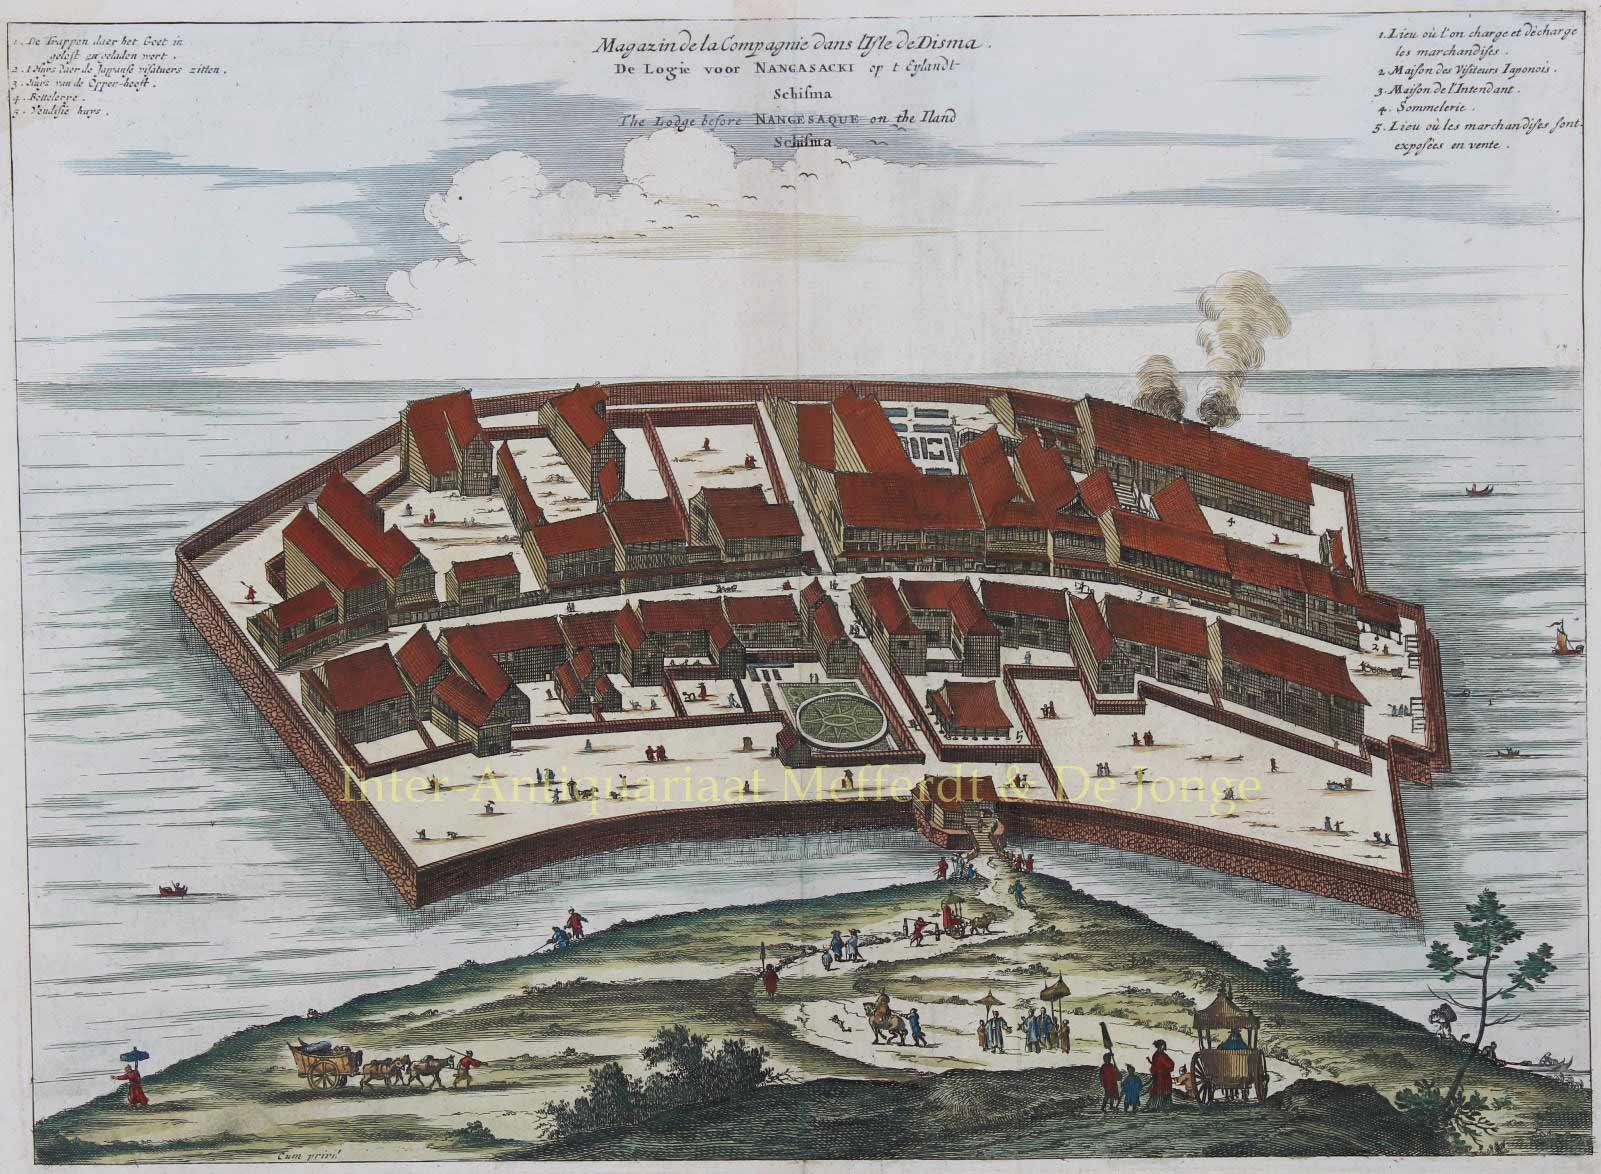 dejima-eiland-jacob-van-meurs-1669